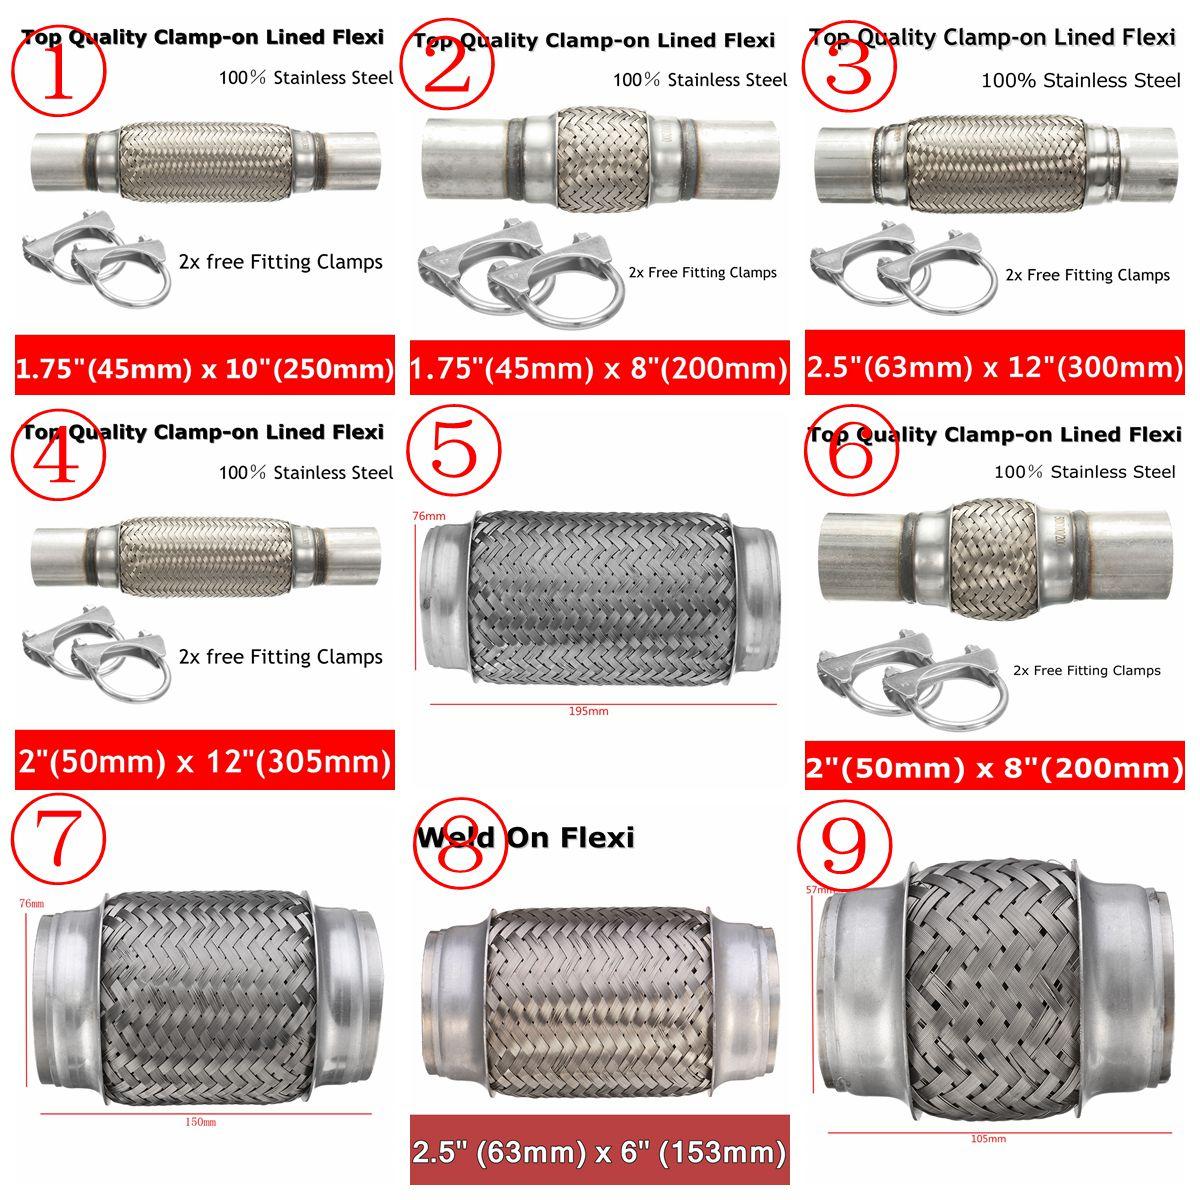 Inoxidable escape Flex tubo común Flexi reparación Flexi de 300x63 50mm 250x45mm 200x76 50 46mm 150x76 63mm 100 57mm